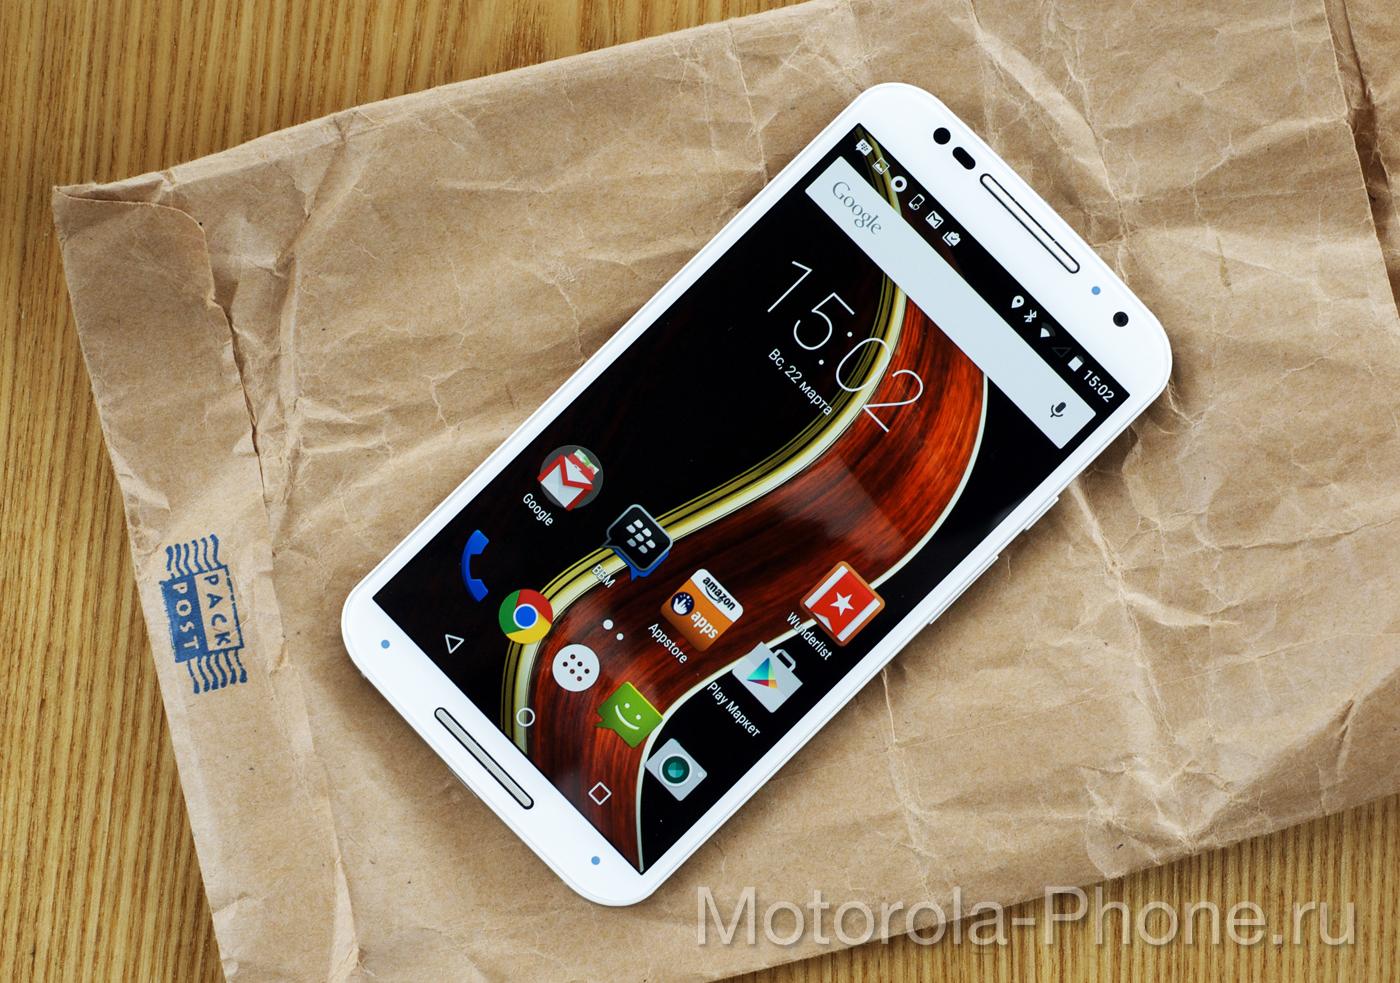 Motorola Moto X Wallpaper Motorola Phone 1400x983